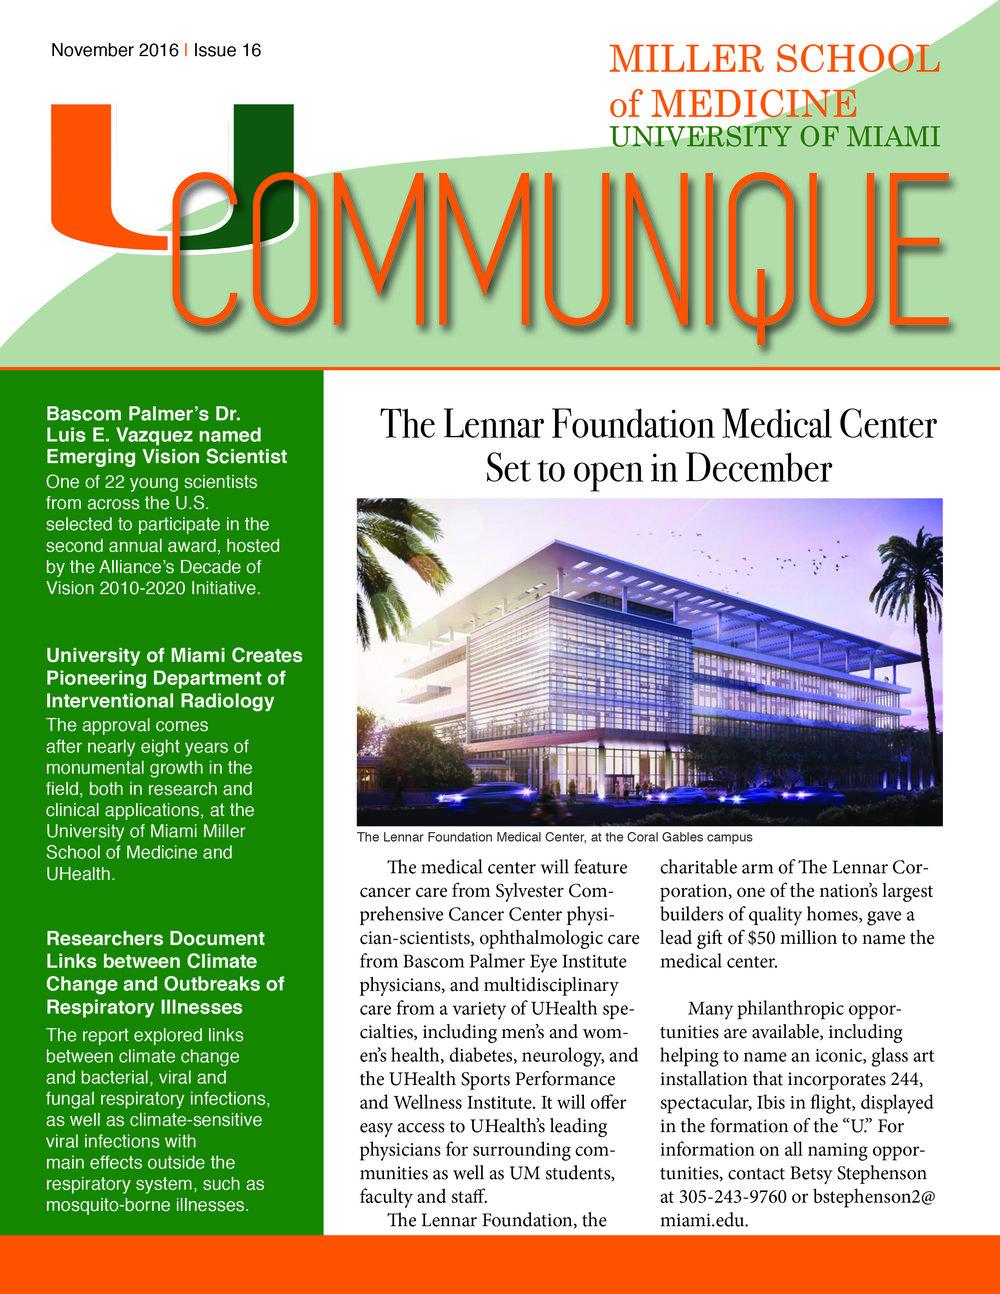 Communique_Newsletter-1.jpg